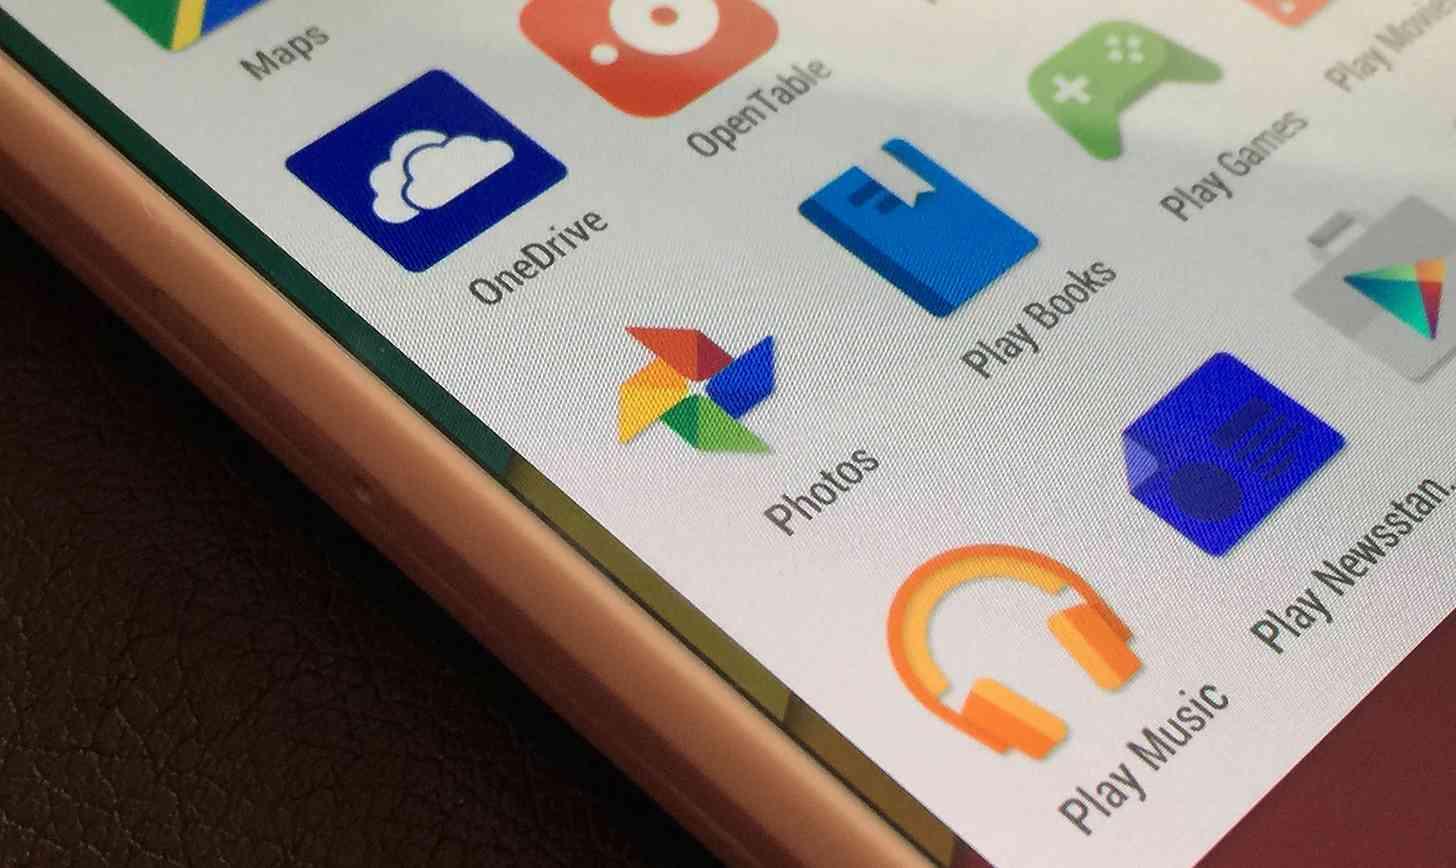 Android Google+ Photos app